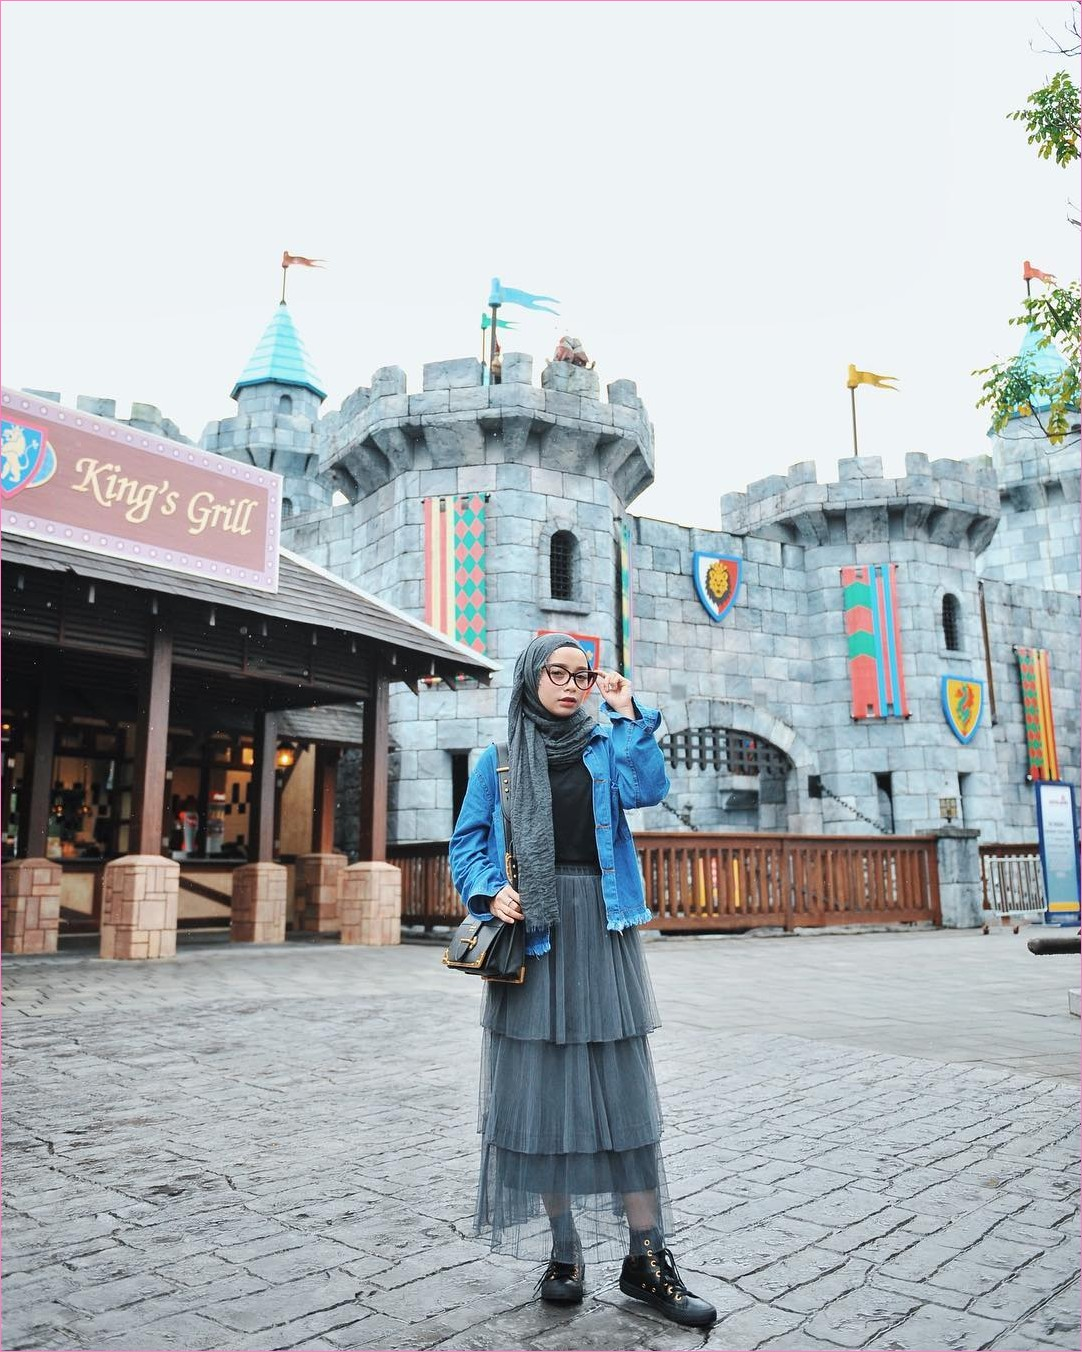 Outfit Rok Untuk Hijabers Ala Selebgram 2018 ankle boots mangset kacamata bulat hitam jaket jeans denim hijab pashmina rawis rok semi sheer lined skirt abu sedang handbags biru tua ootd trendy